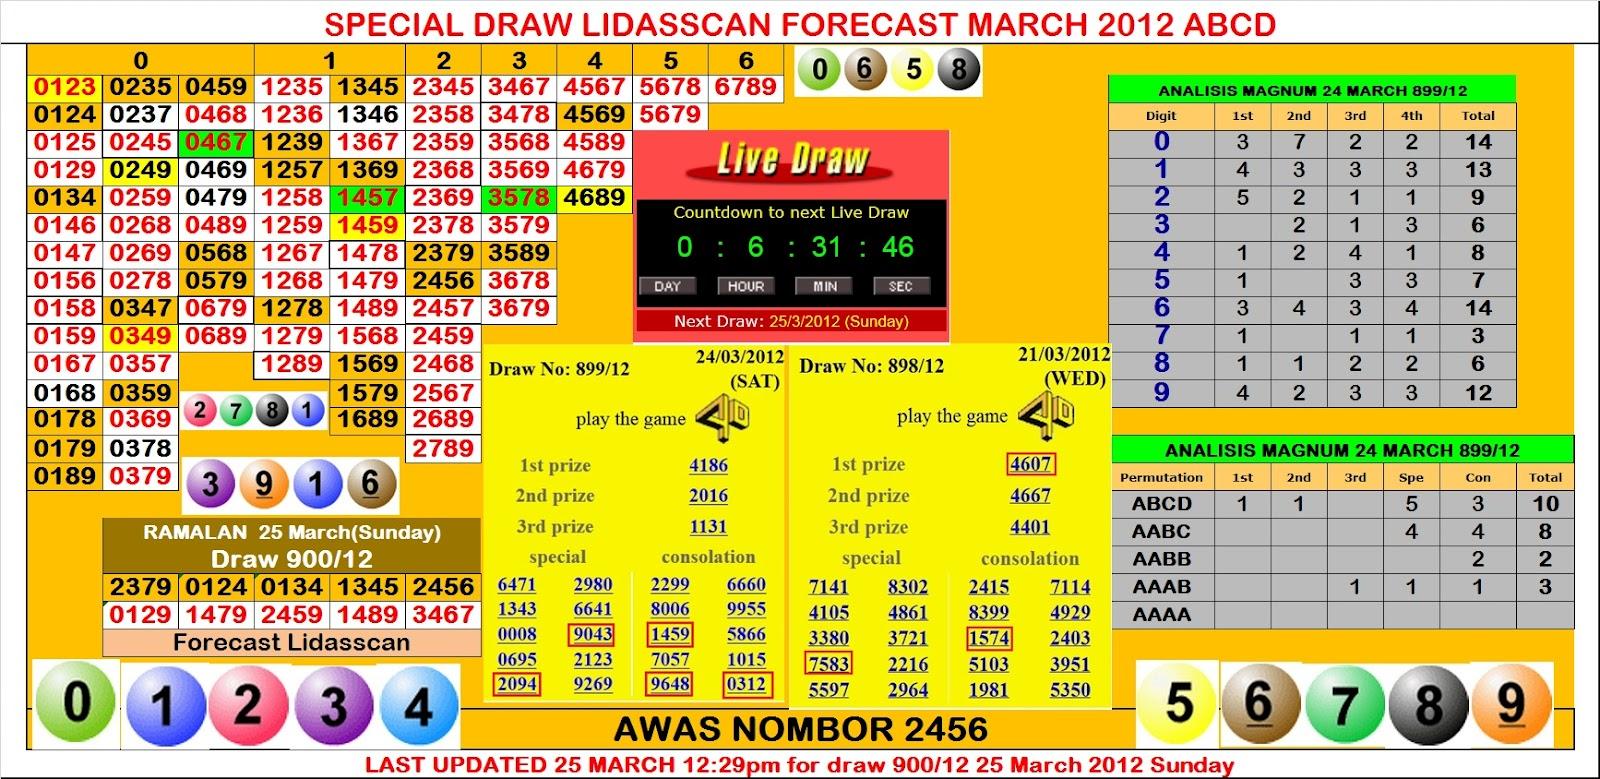 FORECAST LIDASSCAN: FORECAST 25 MARCH SUNDAY LIDASSCAN MAGNUM TOTO SARAWAK CASH SWEEP